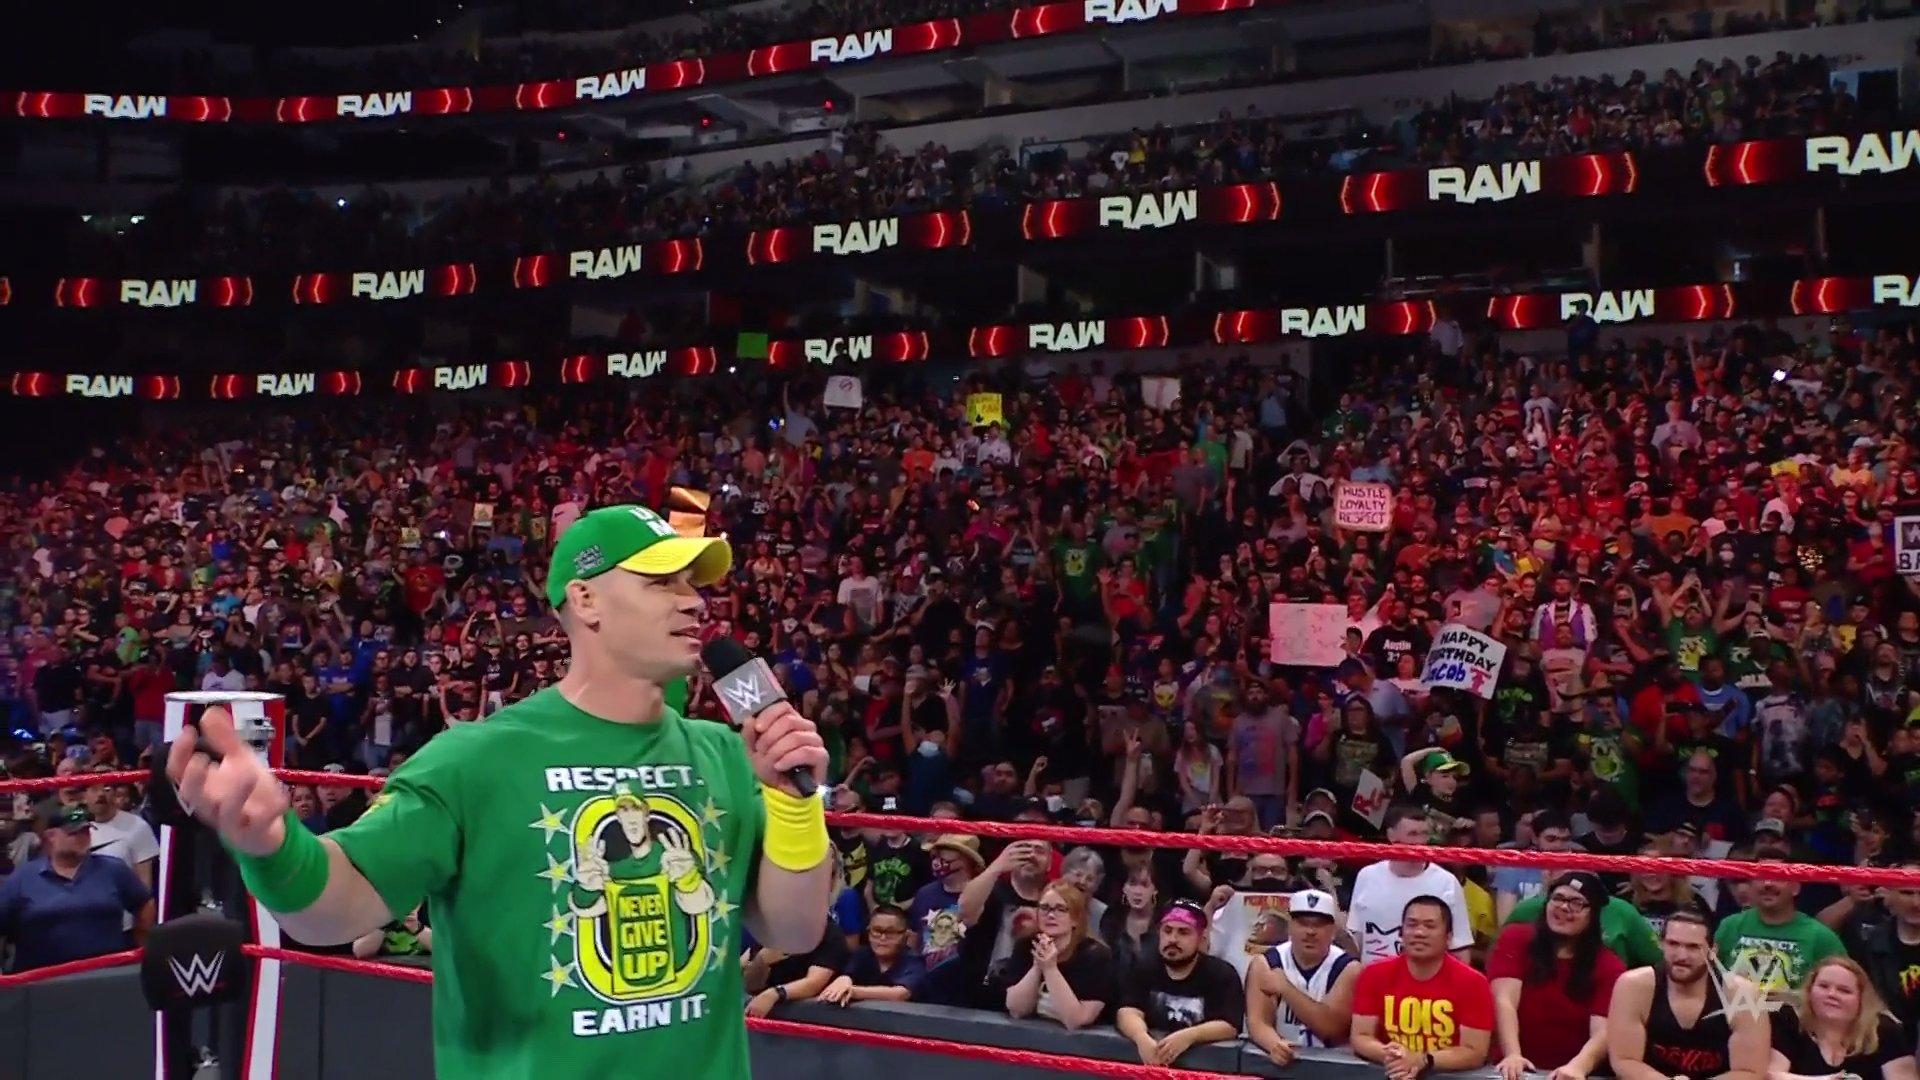 WWE SummerSlam 2021: John Cena And Goldberg Issue Title Match Challenges 1